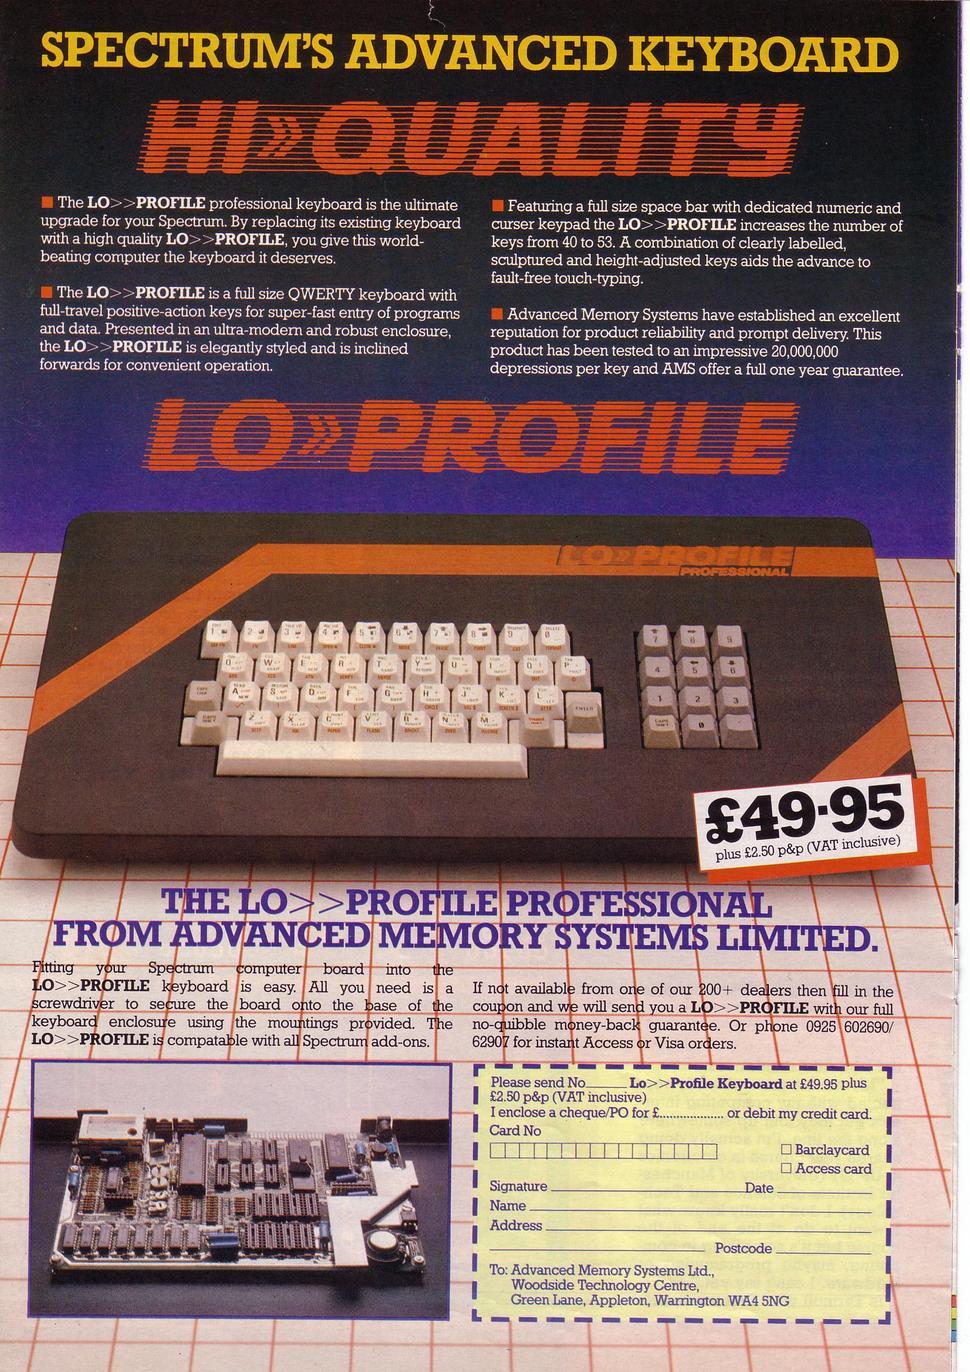 Lo Gt Gt Profile Professional Keyboard For Sinclair Zx Spectrum Nightfall Blog Retrocomputermania Com